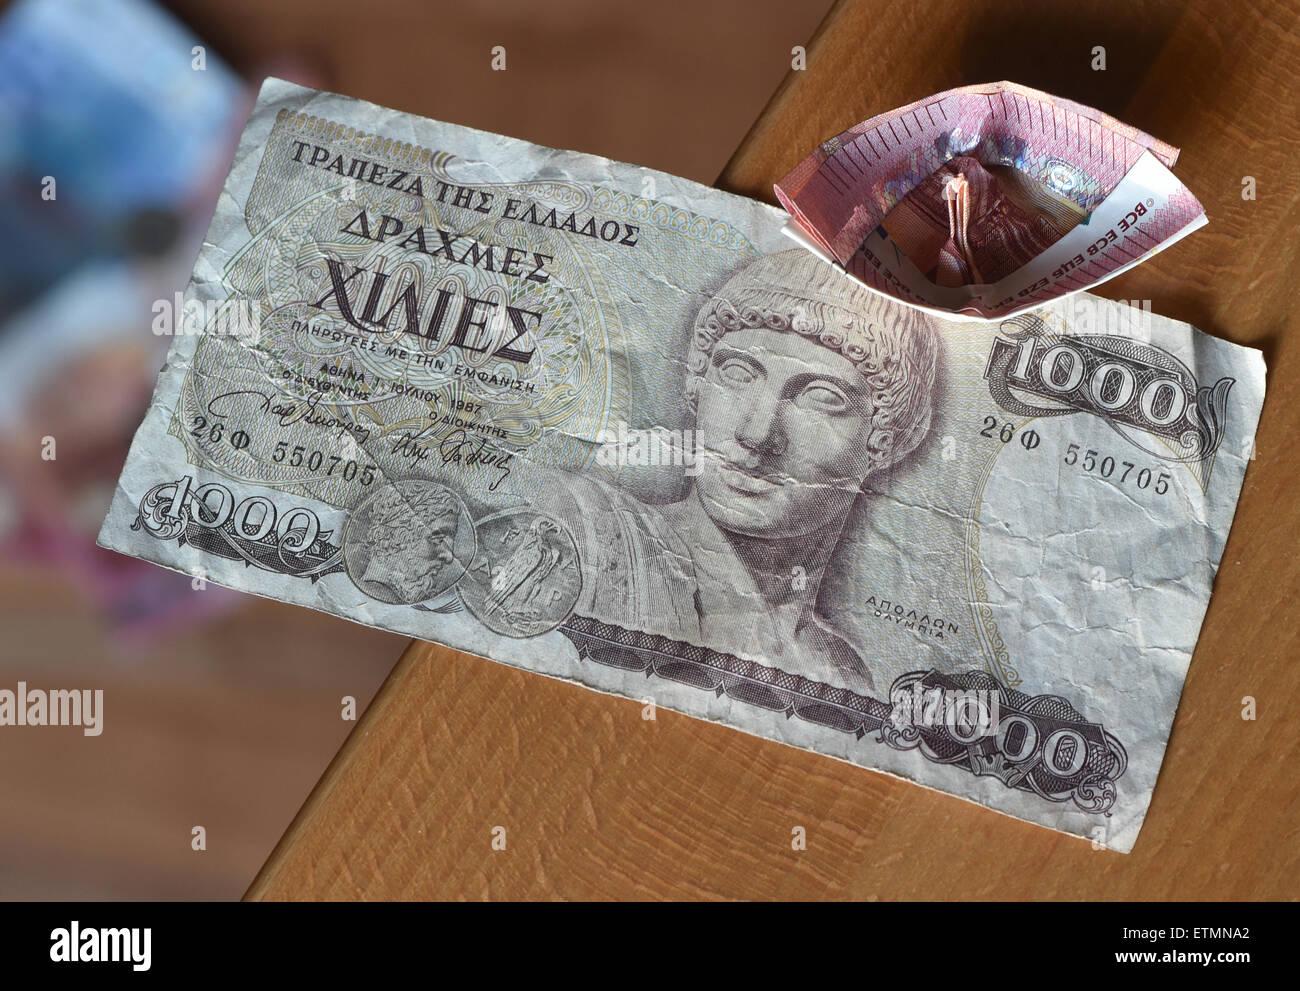 Berlin, Germany. 14th June, 2015. ILLUSTRATION - a ten euro bill which has been folded into a boat lies on a 1000 Greek drachma bill in Berlin, Germany, 14 June 2015. Photo: Jens Kalaene/dpa/Alamy Live News Stock Photo